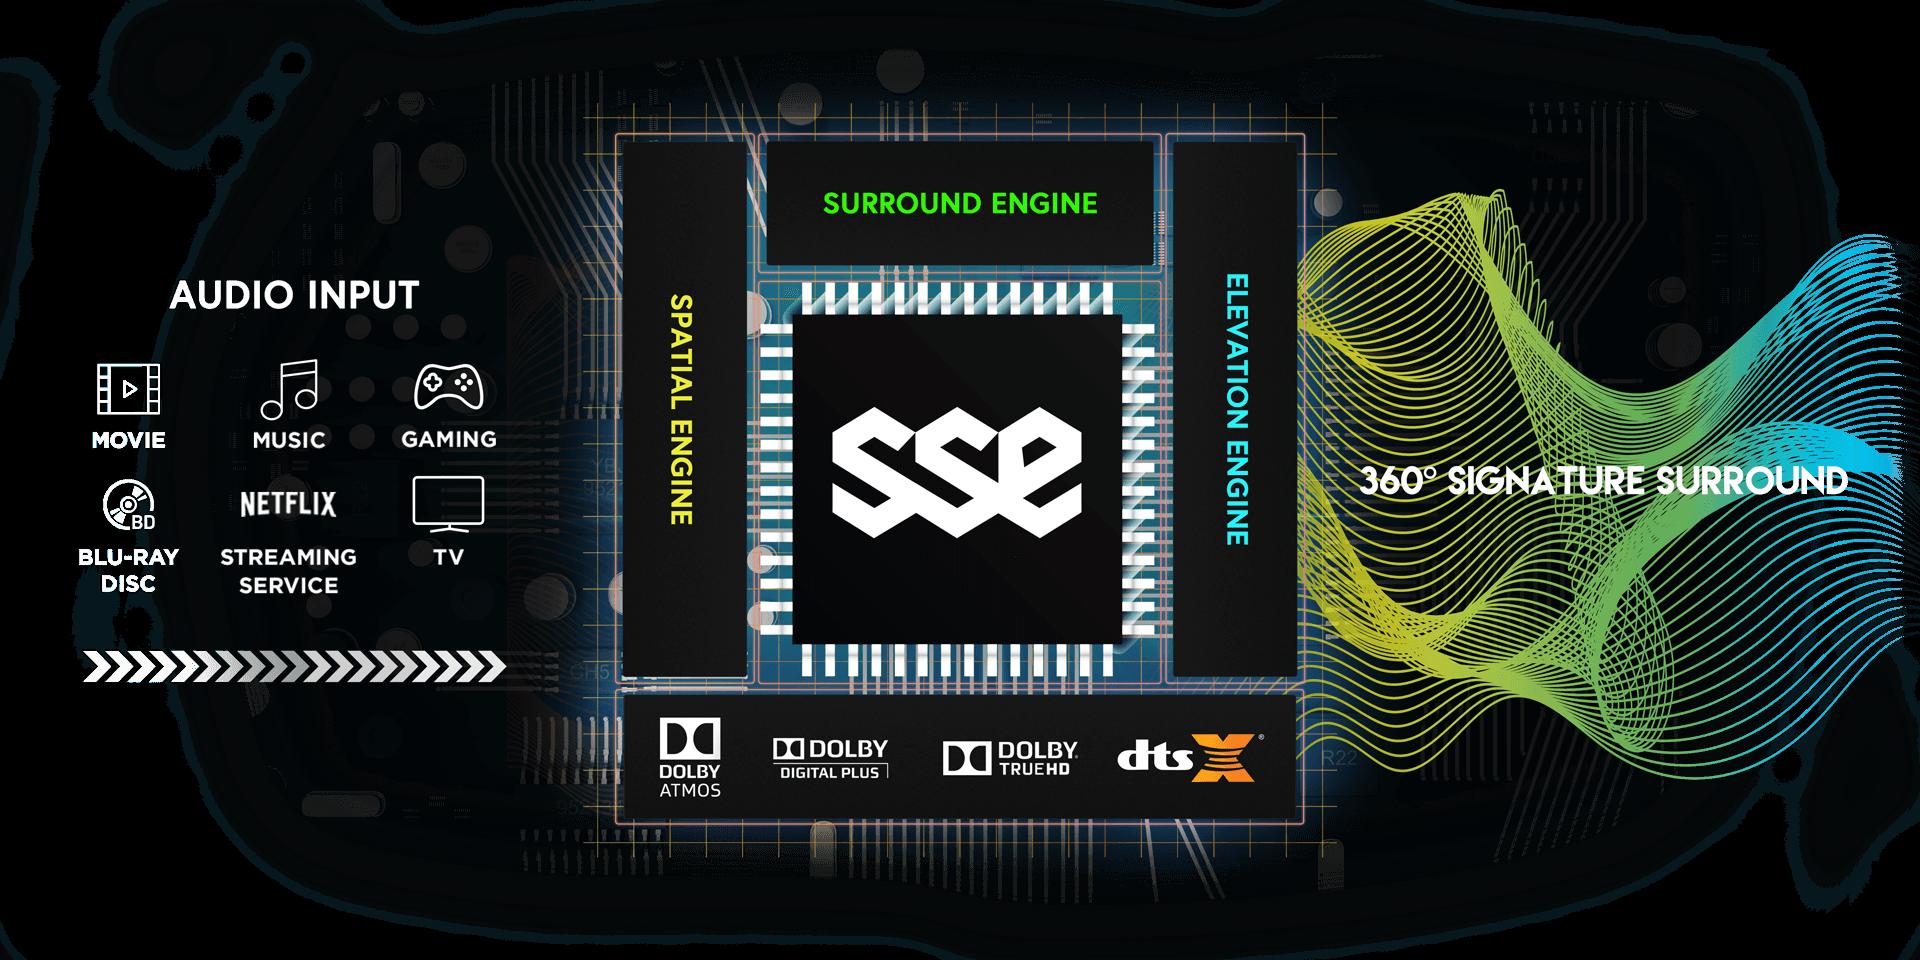 Shockwafe Ultra 9 2 SSE with Dolby Atmos Soundbar | Dual